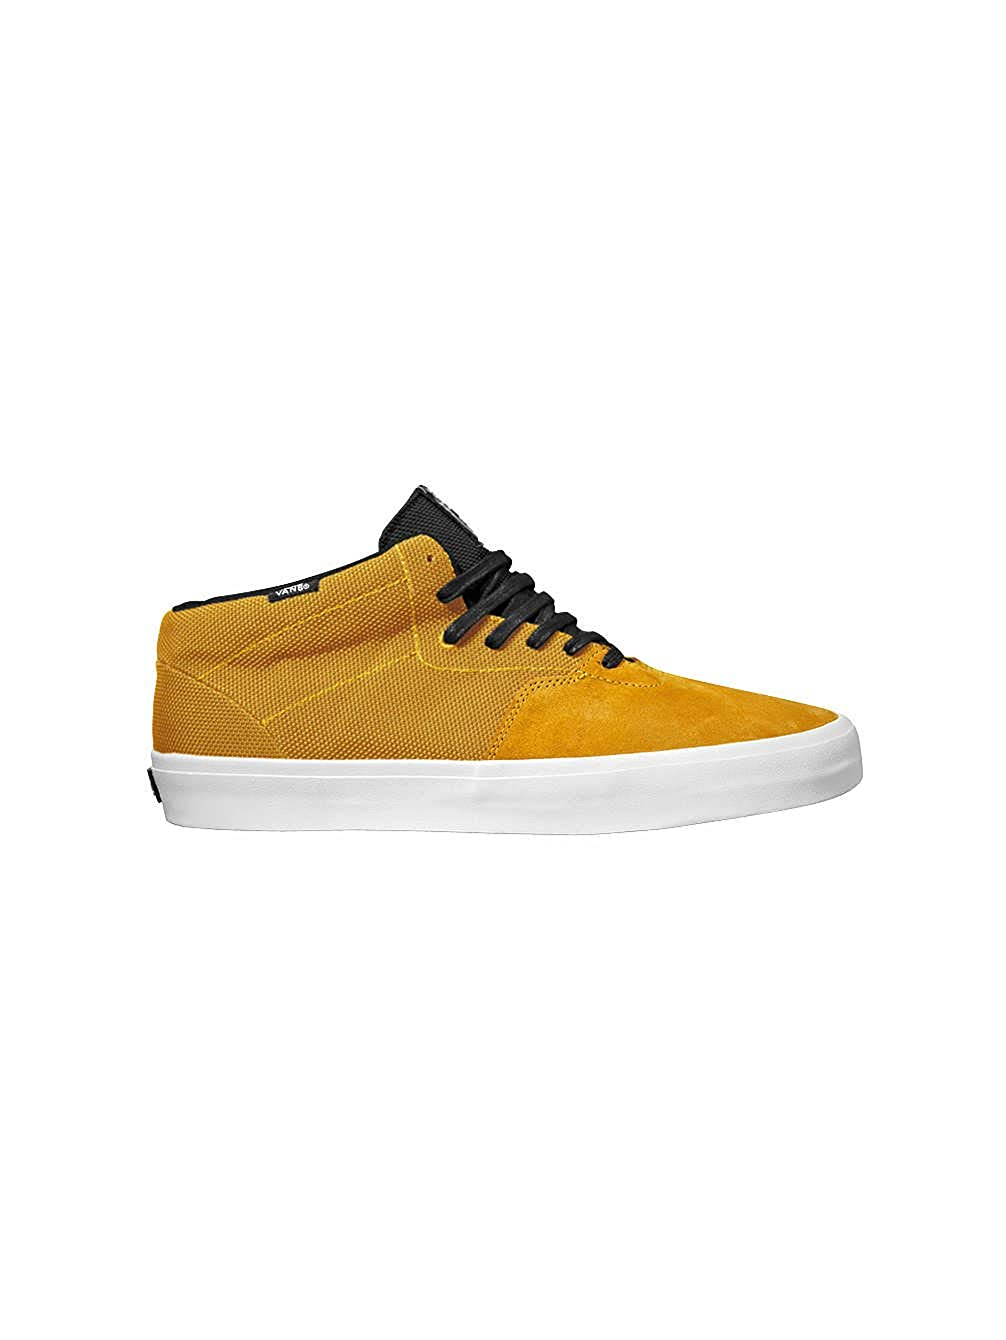 ed631faa0a Vans CAB LITE Skateboarding Shoes Gold White VN-0SDPGLW  Amazon.ca  Shoes    Handbags